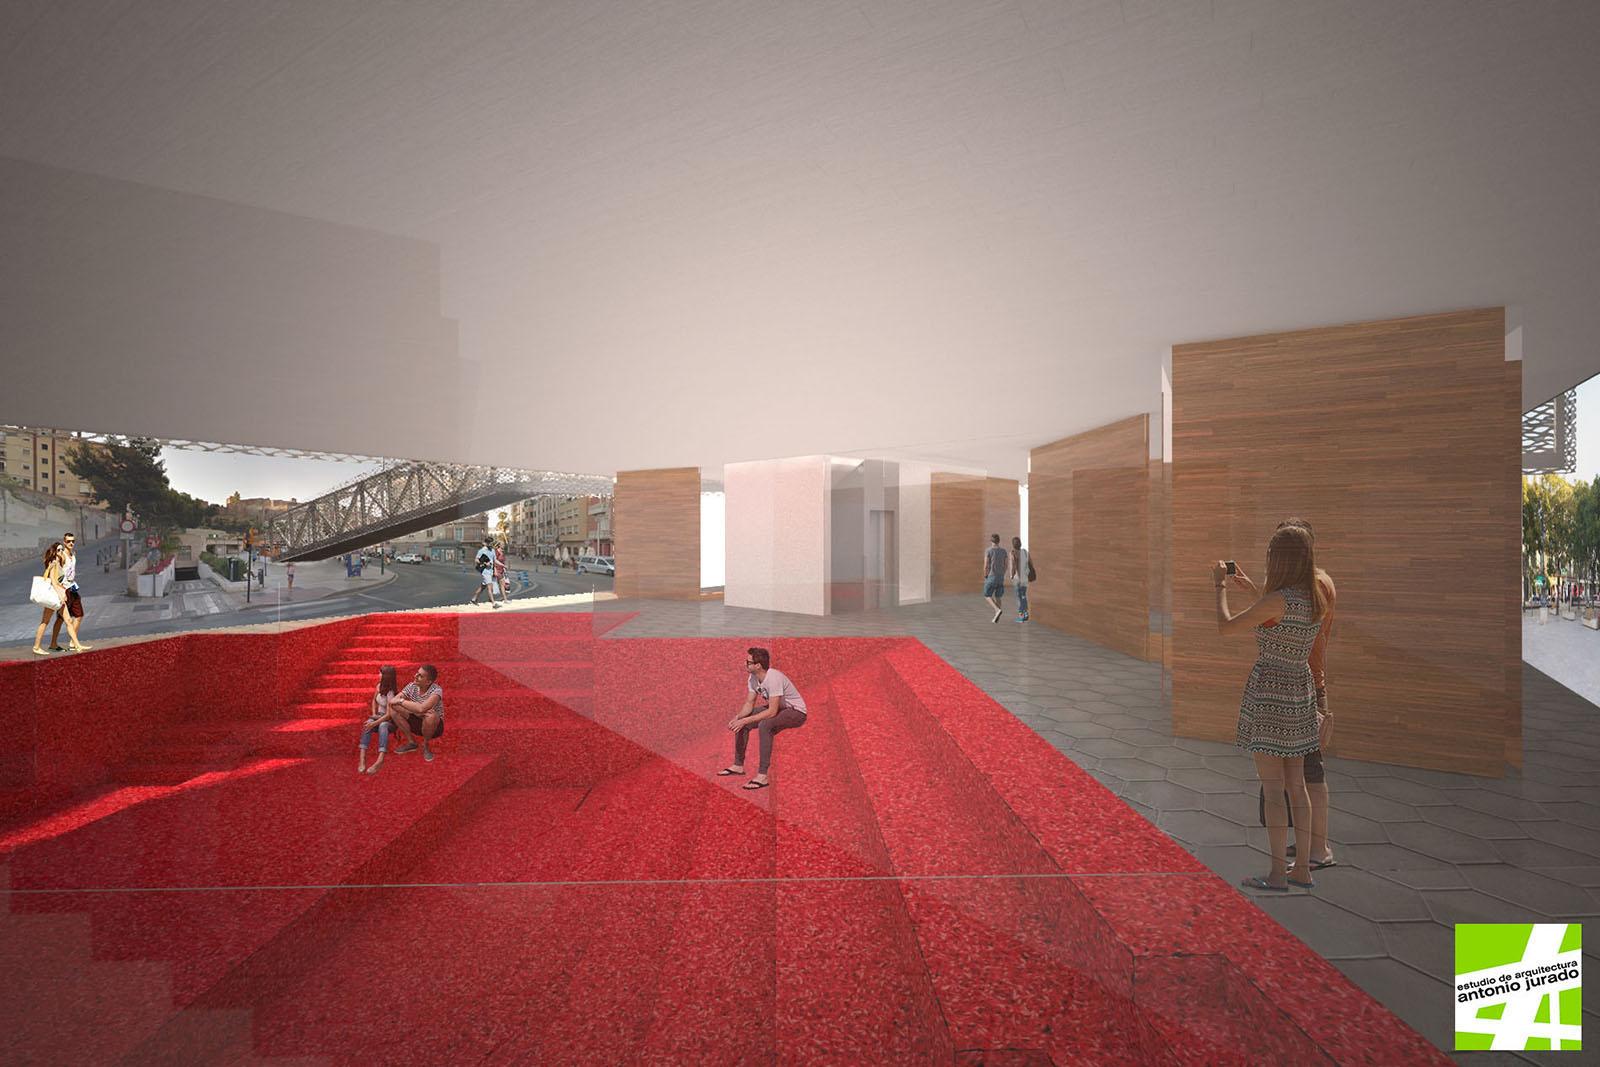 concurso-astoria-victoria-plaza-merced-malaga-antonio-jurado-arquitecto-01